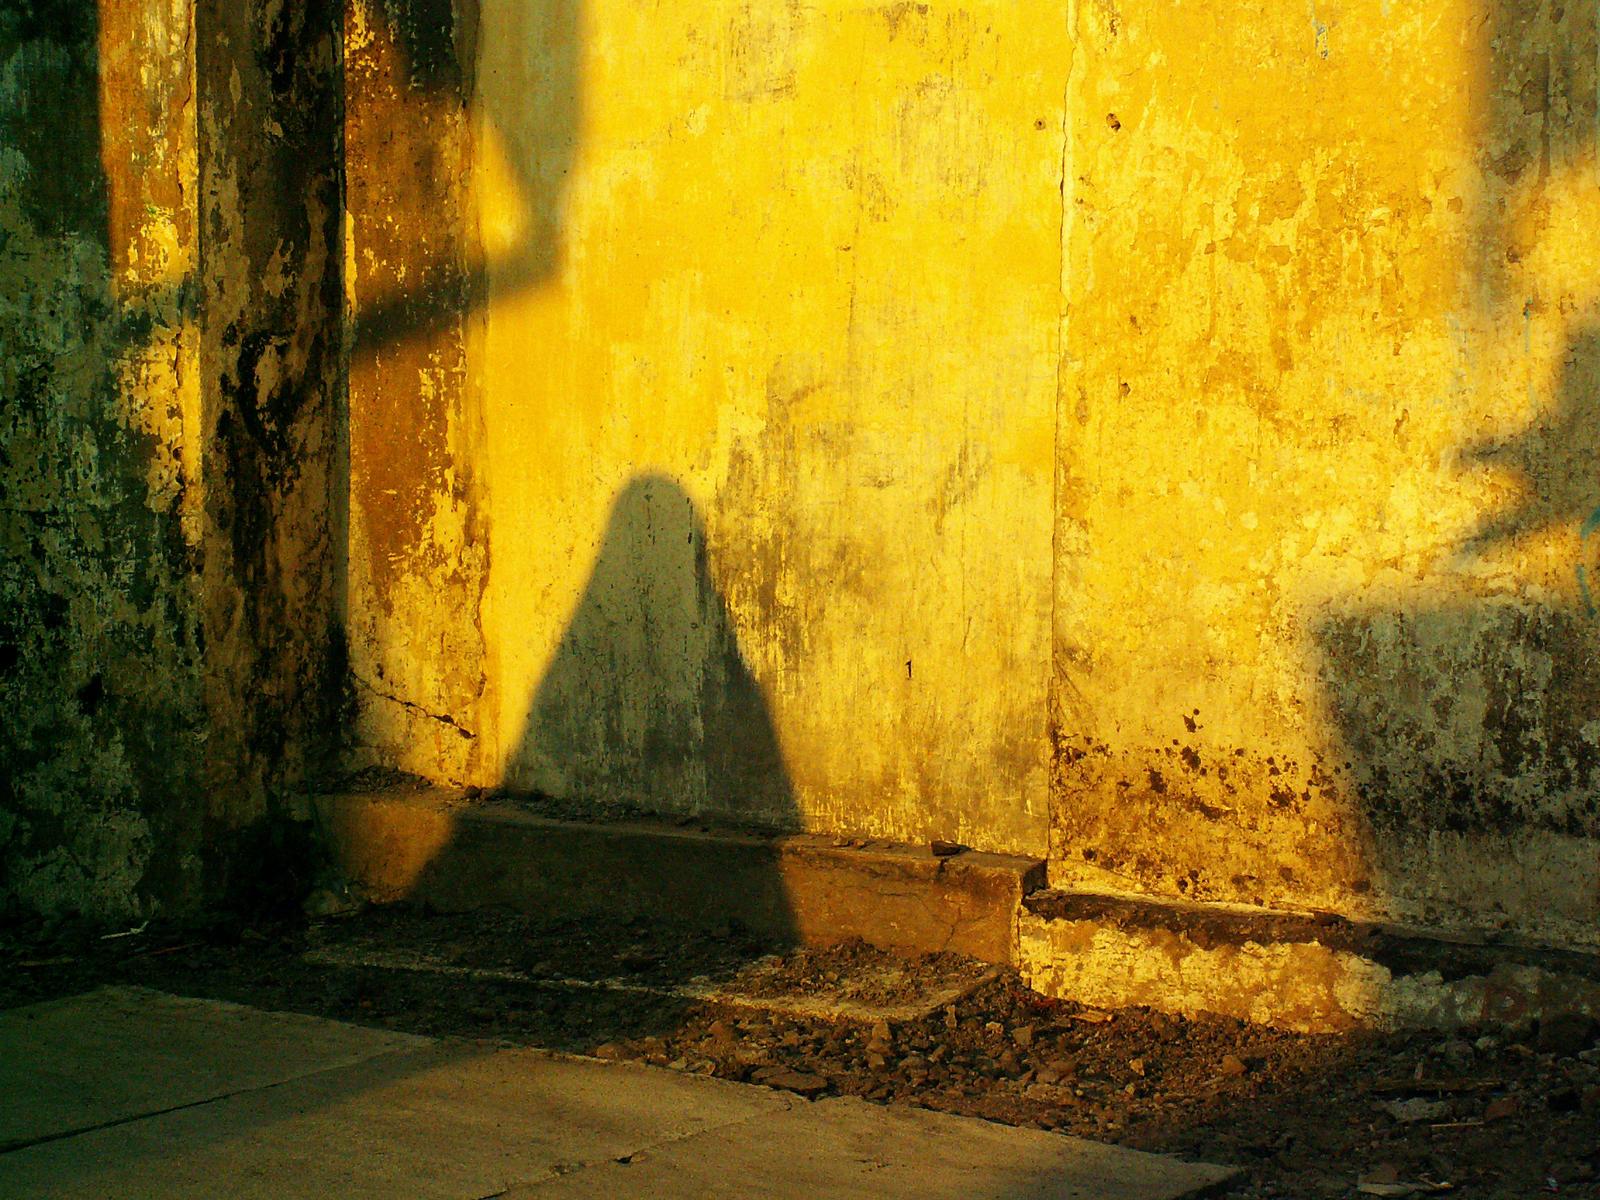 Shadows V by in2ni